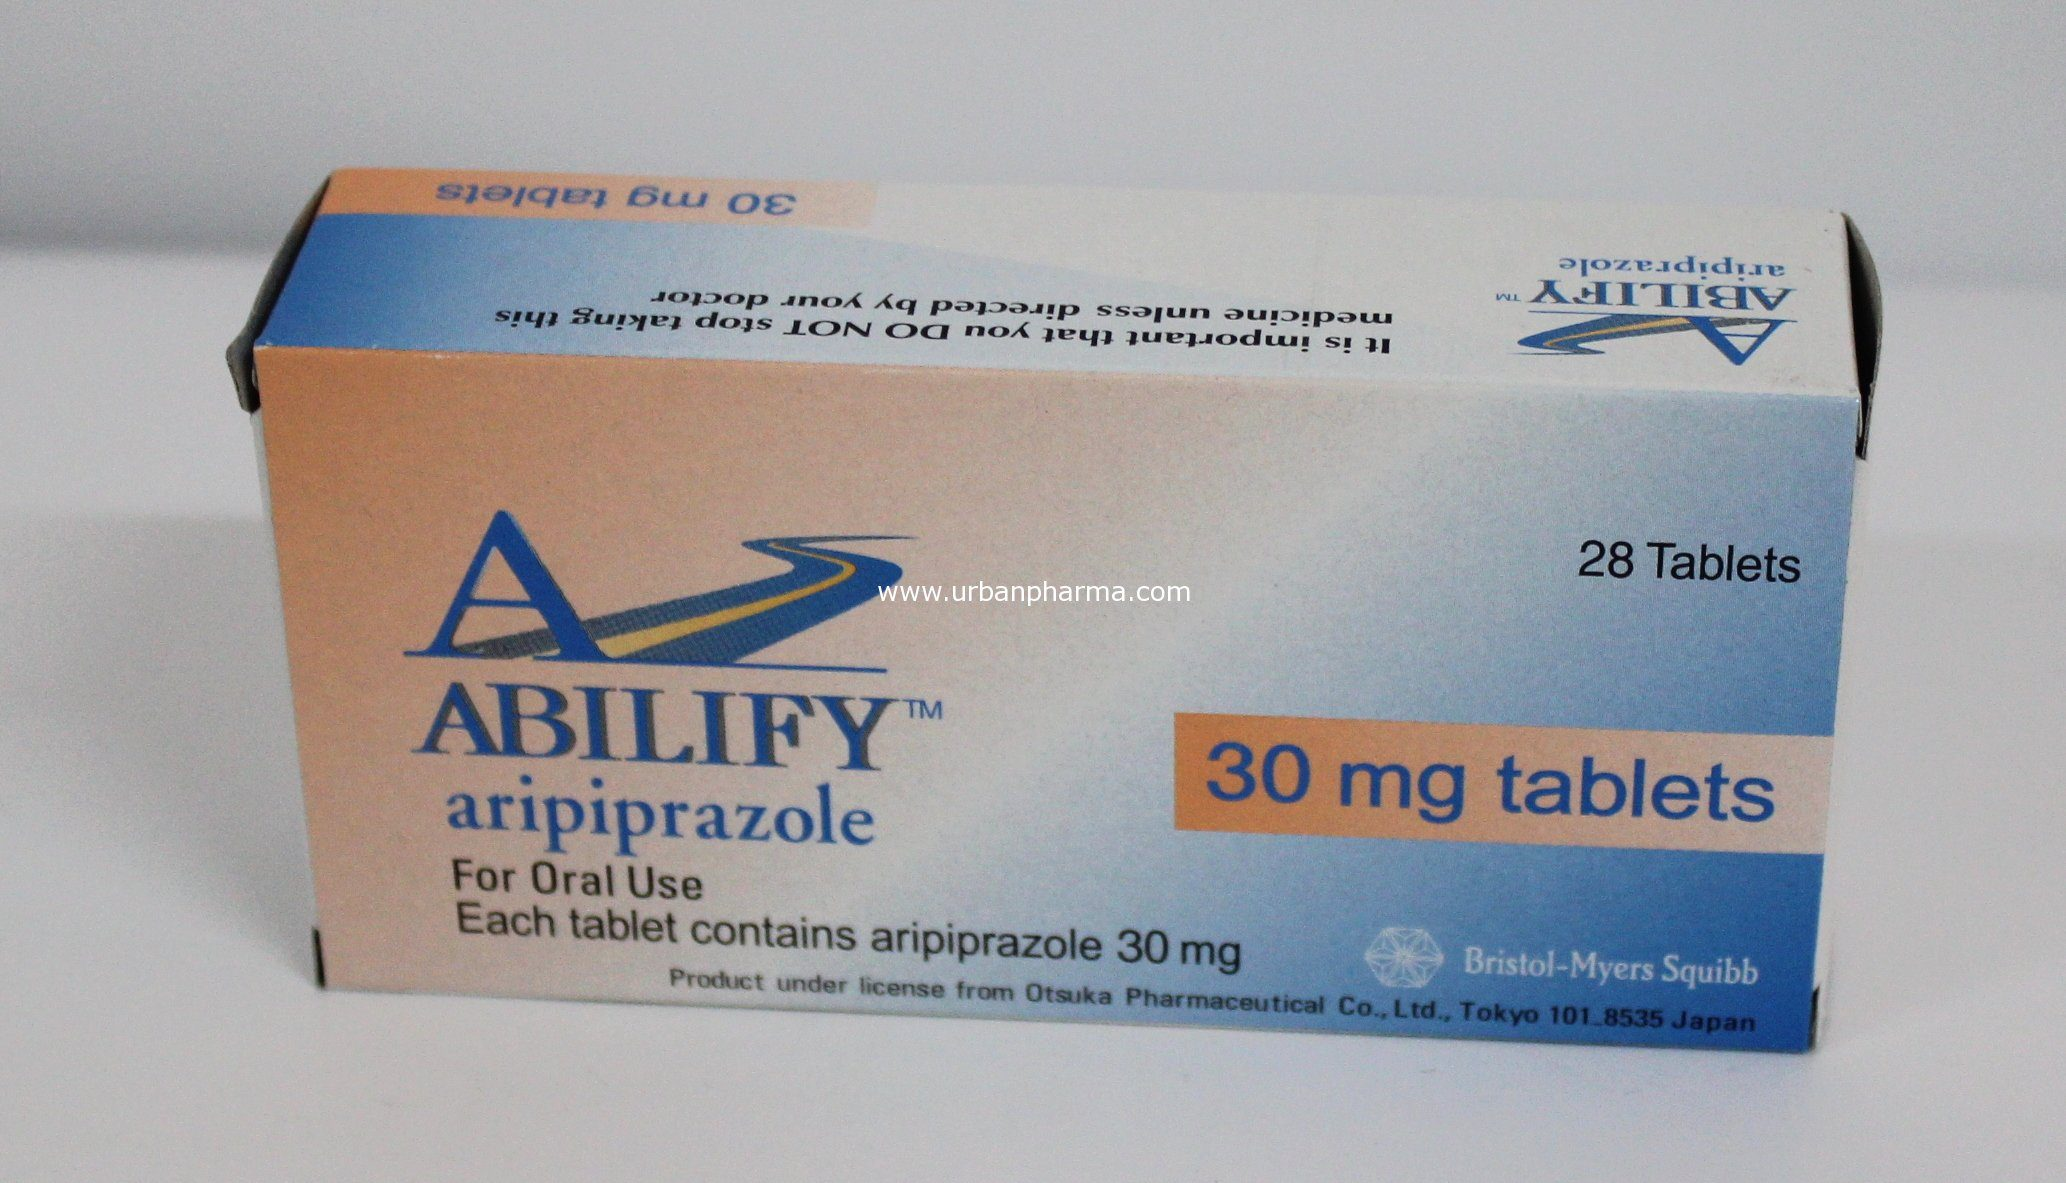 Abilify compulsive gambling lawsuit